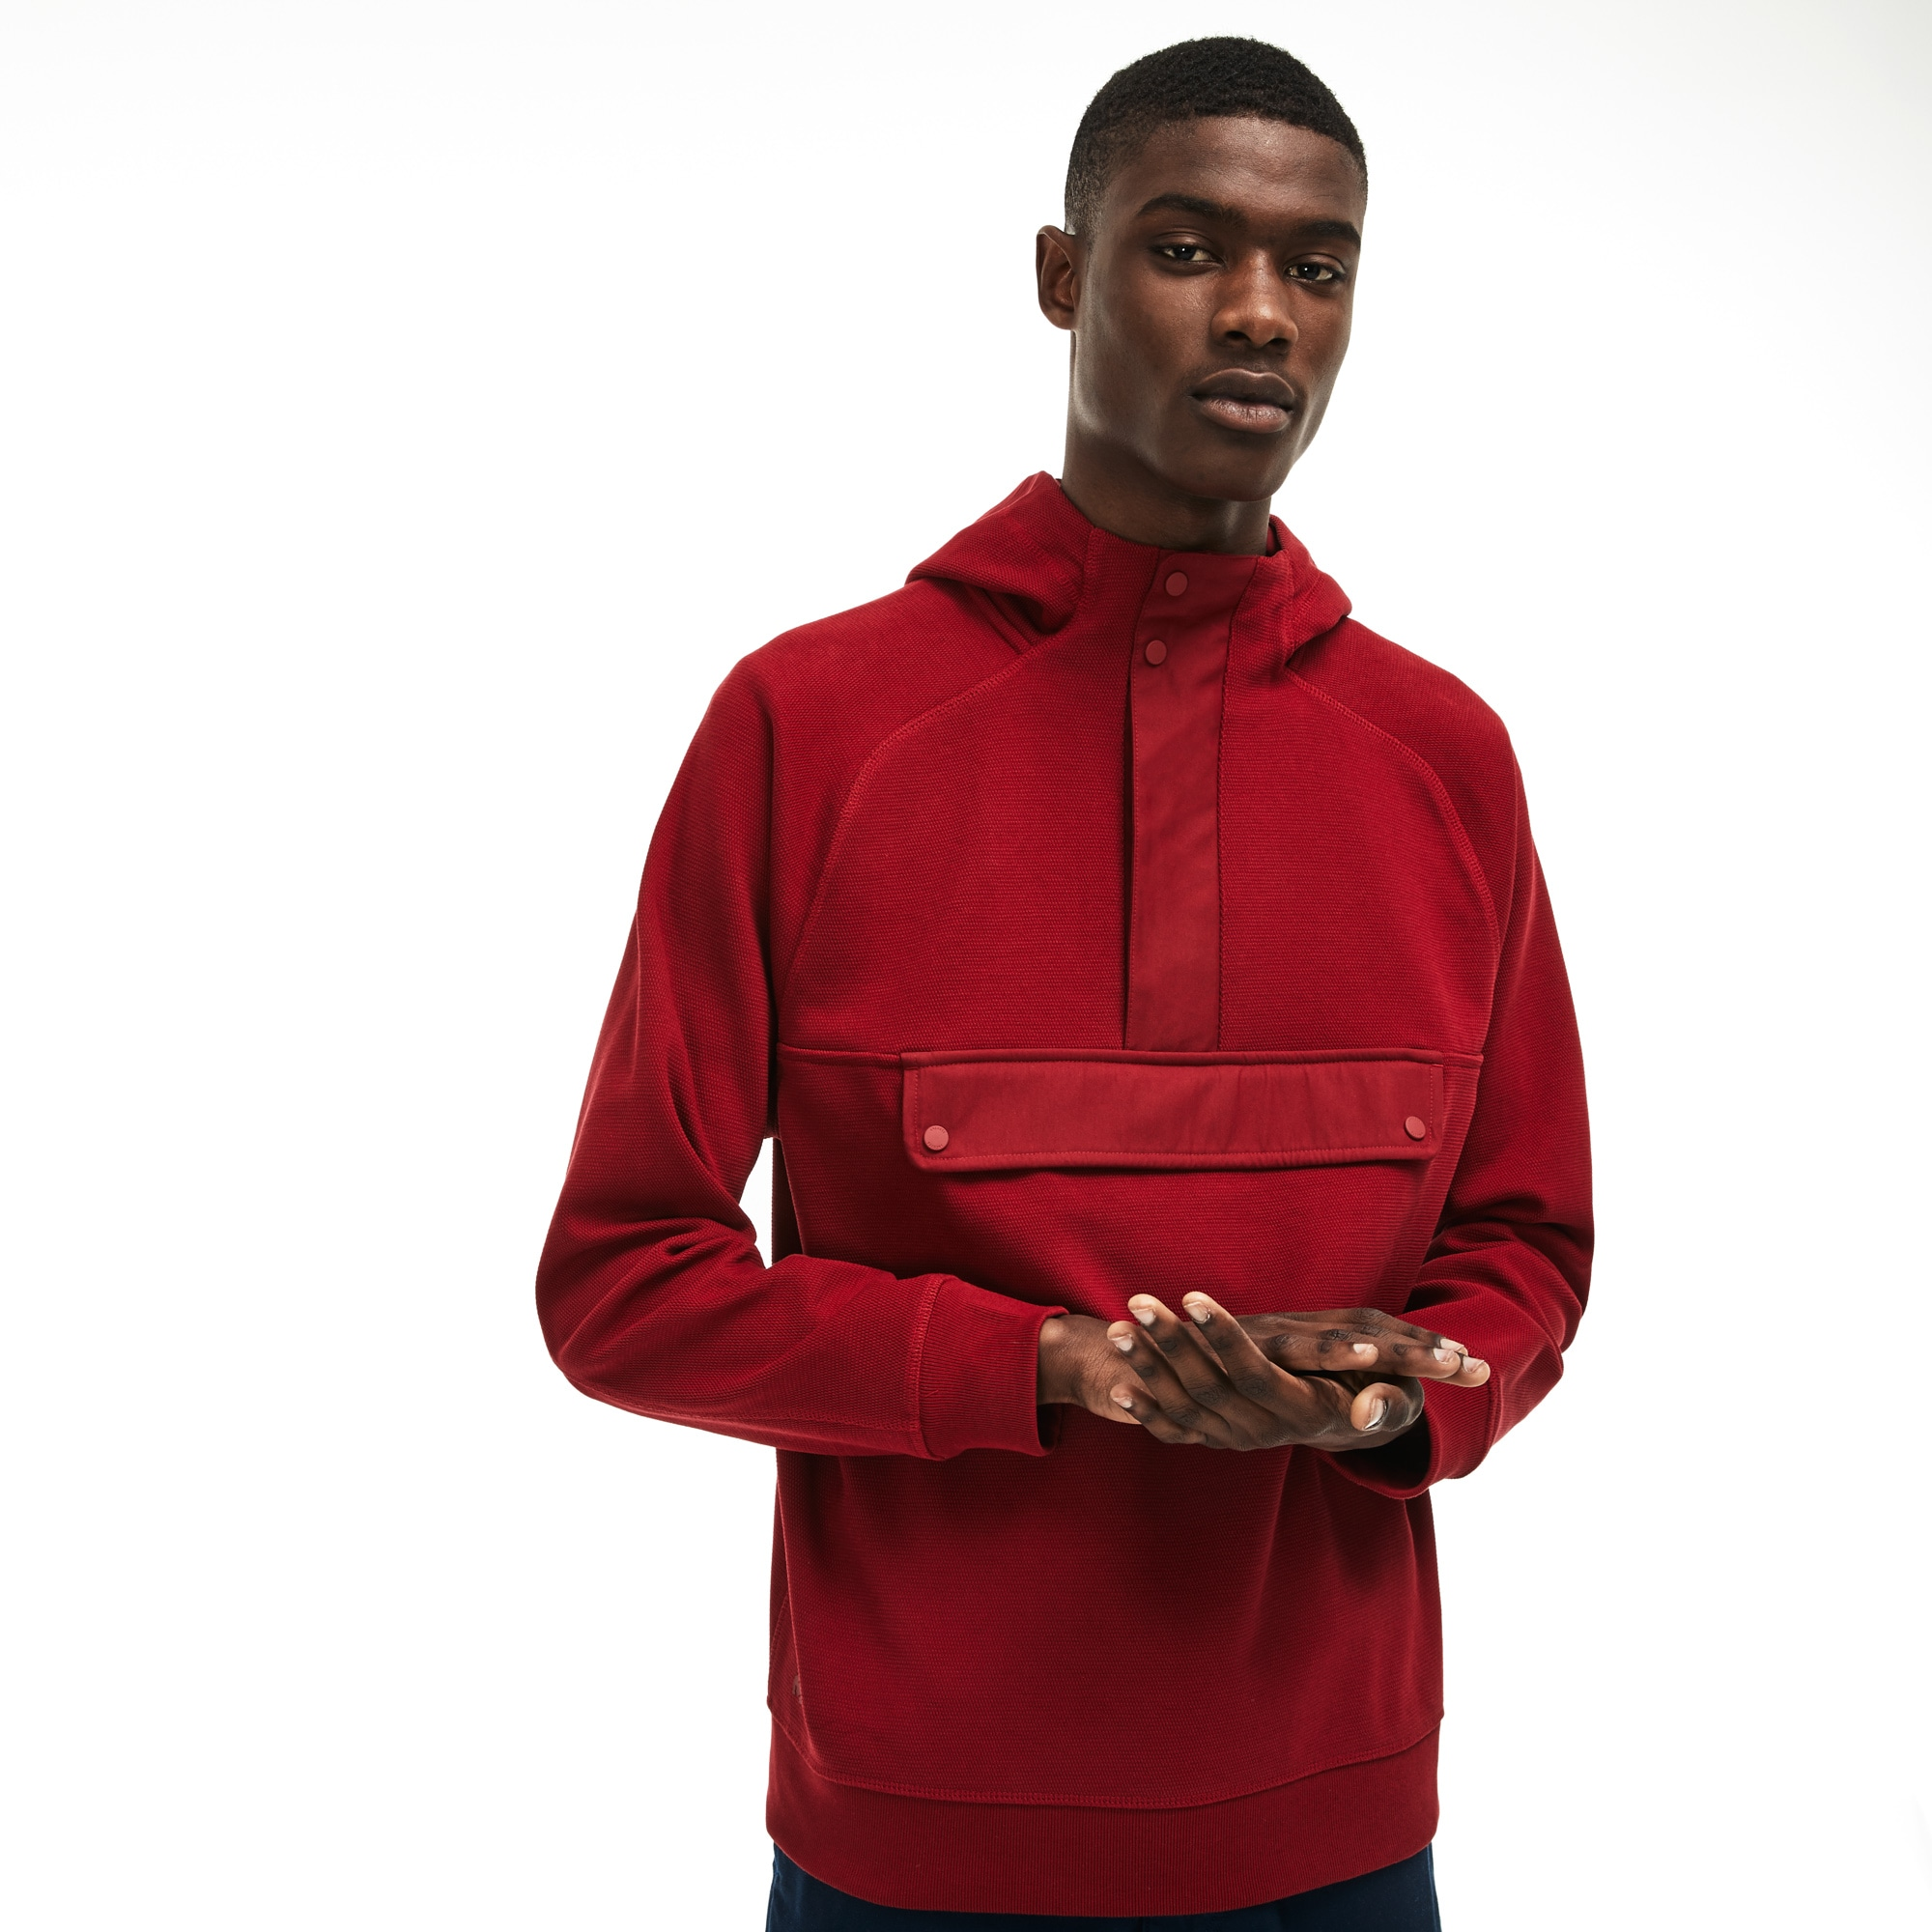 Men's Hooded Cotton Jacquard Piqué Sweatshirt